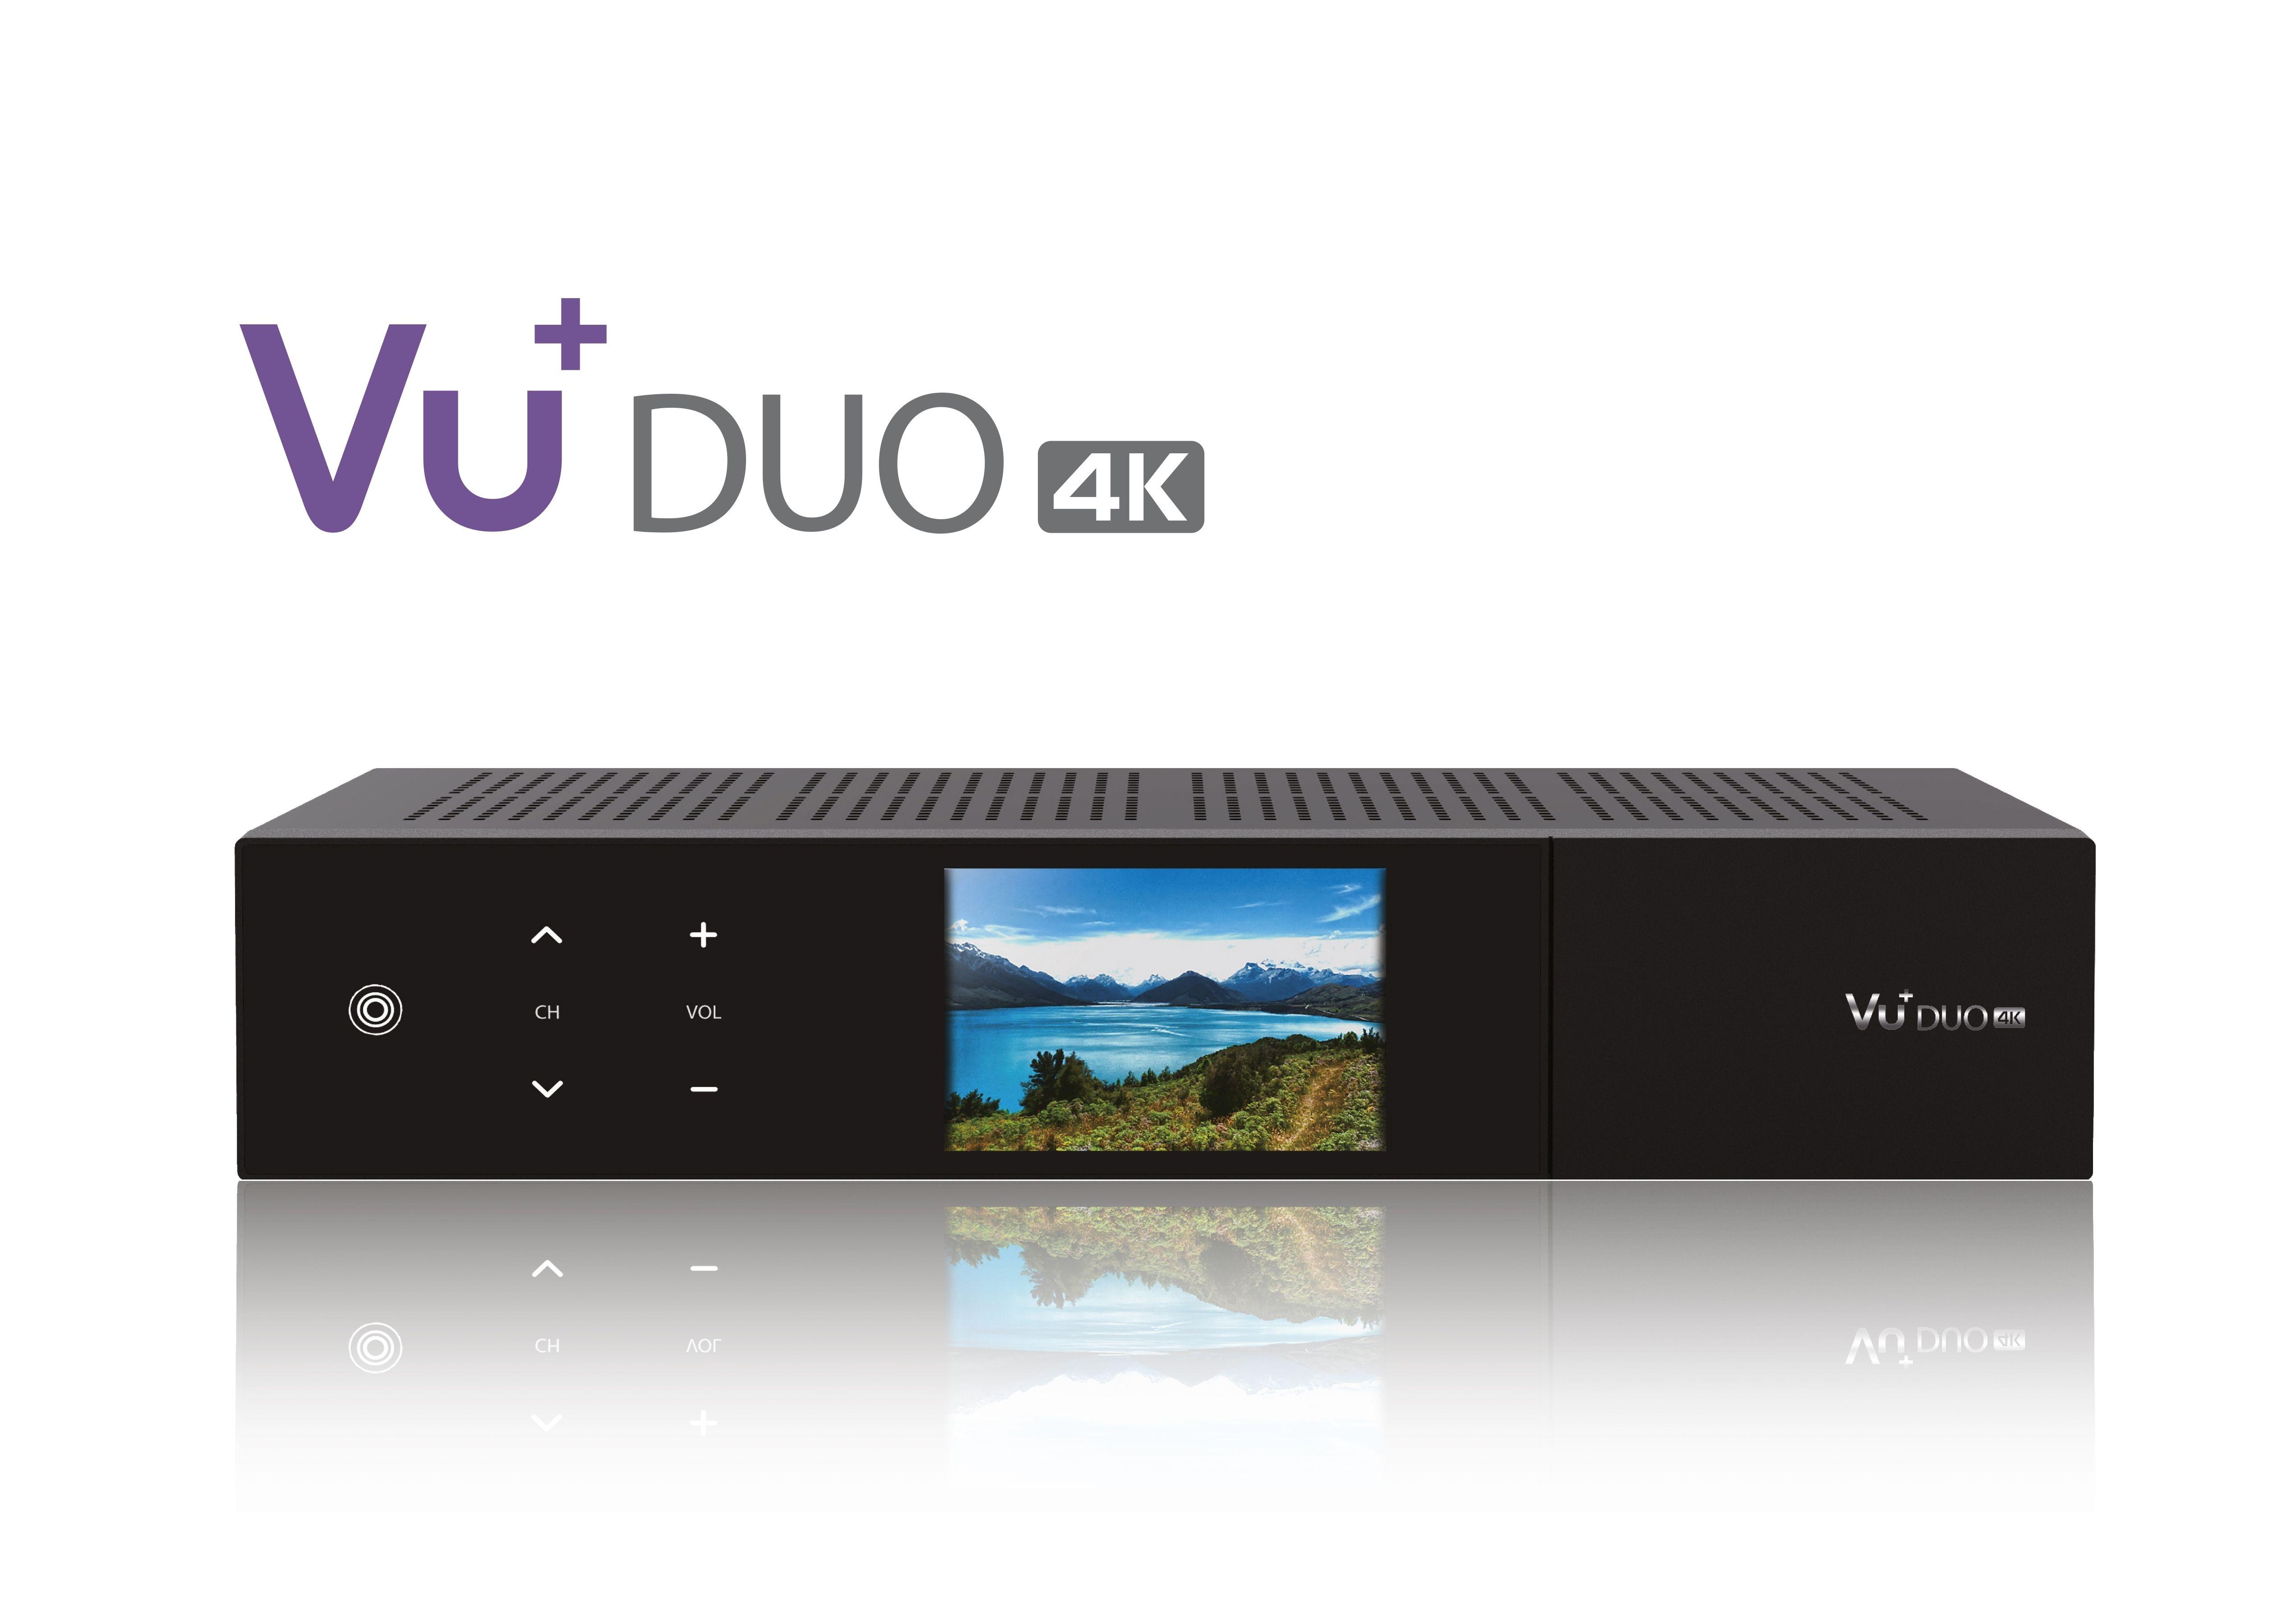 VU+ Duo 4K 1x DVB-S2X FBC Twin Tuner PVR ready Linux Receiver UHD 2160p